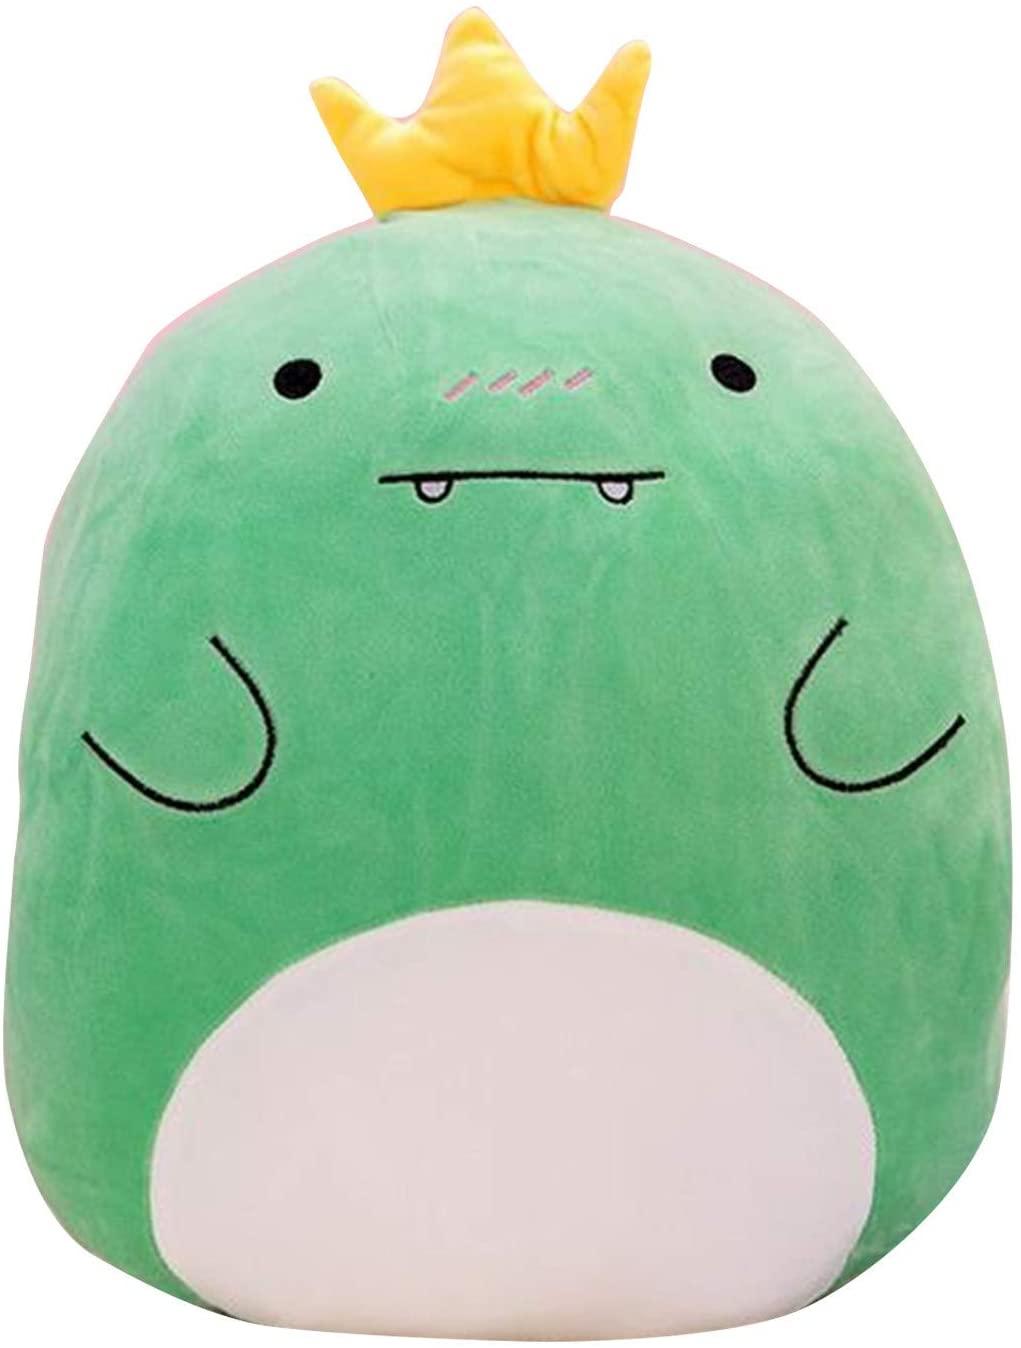 Plush Toys, Kawaii Stuffed Animals, Cute Fluffy Stuffed Animal for Baby, Plush Toys Soft Throw Pillow for Baby, Adult, Kids, Toddler(Dinosaur